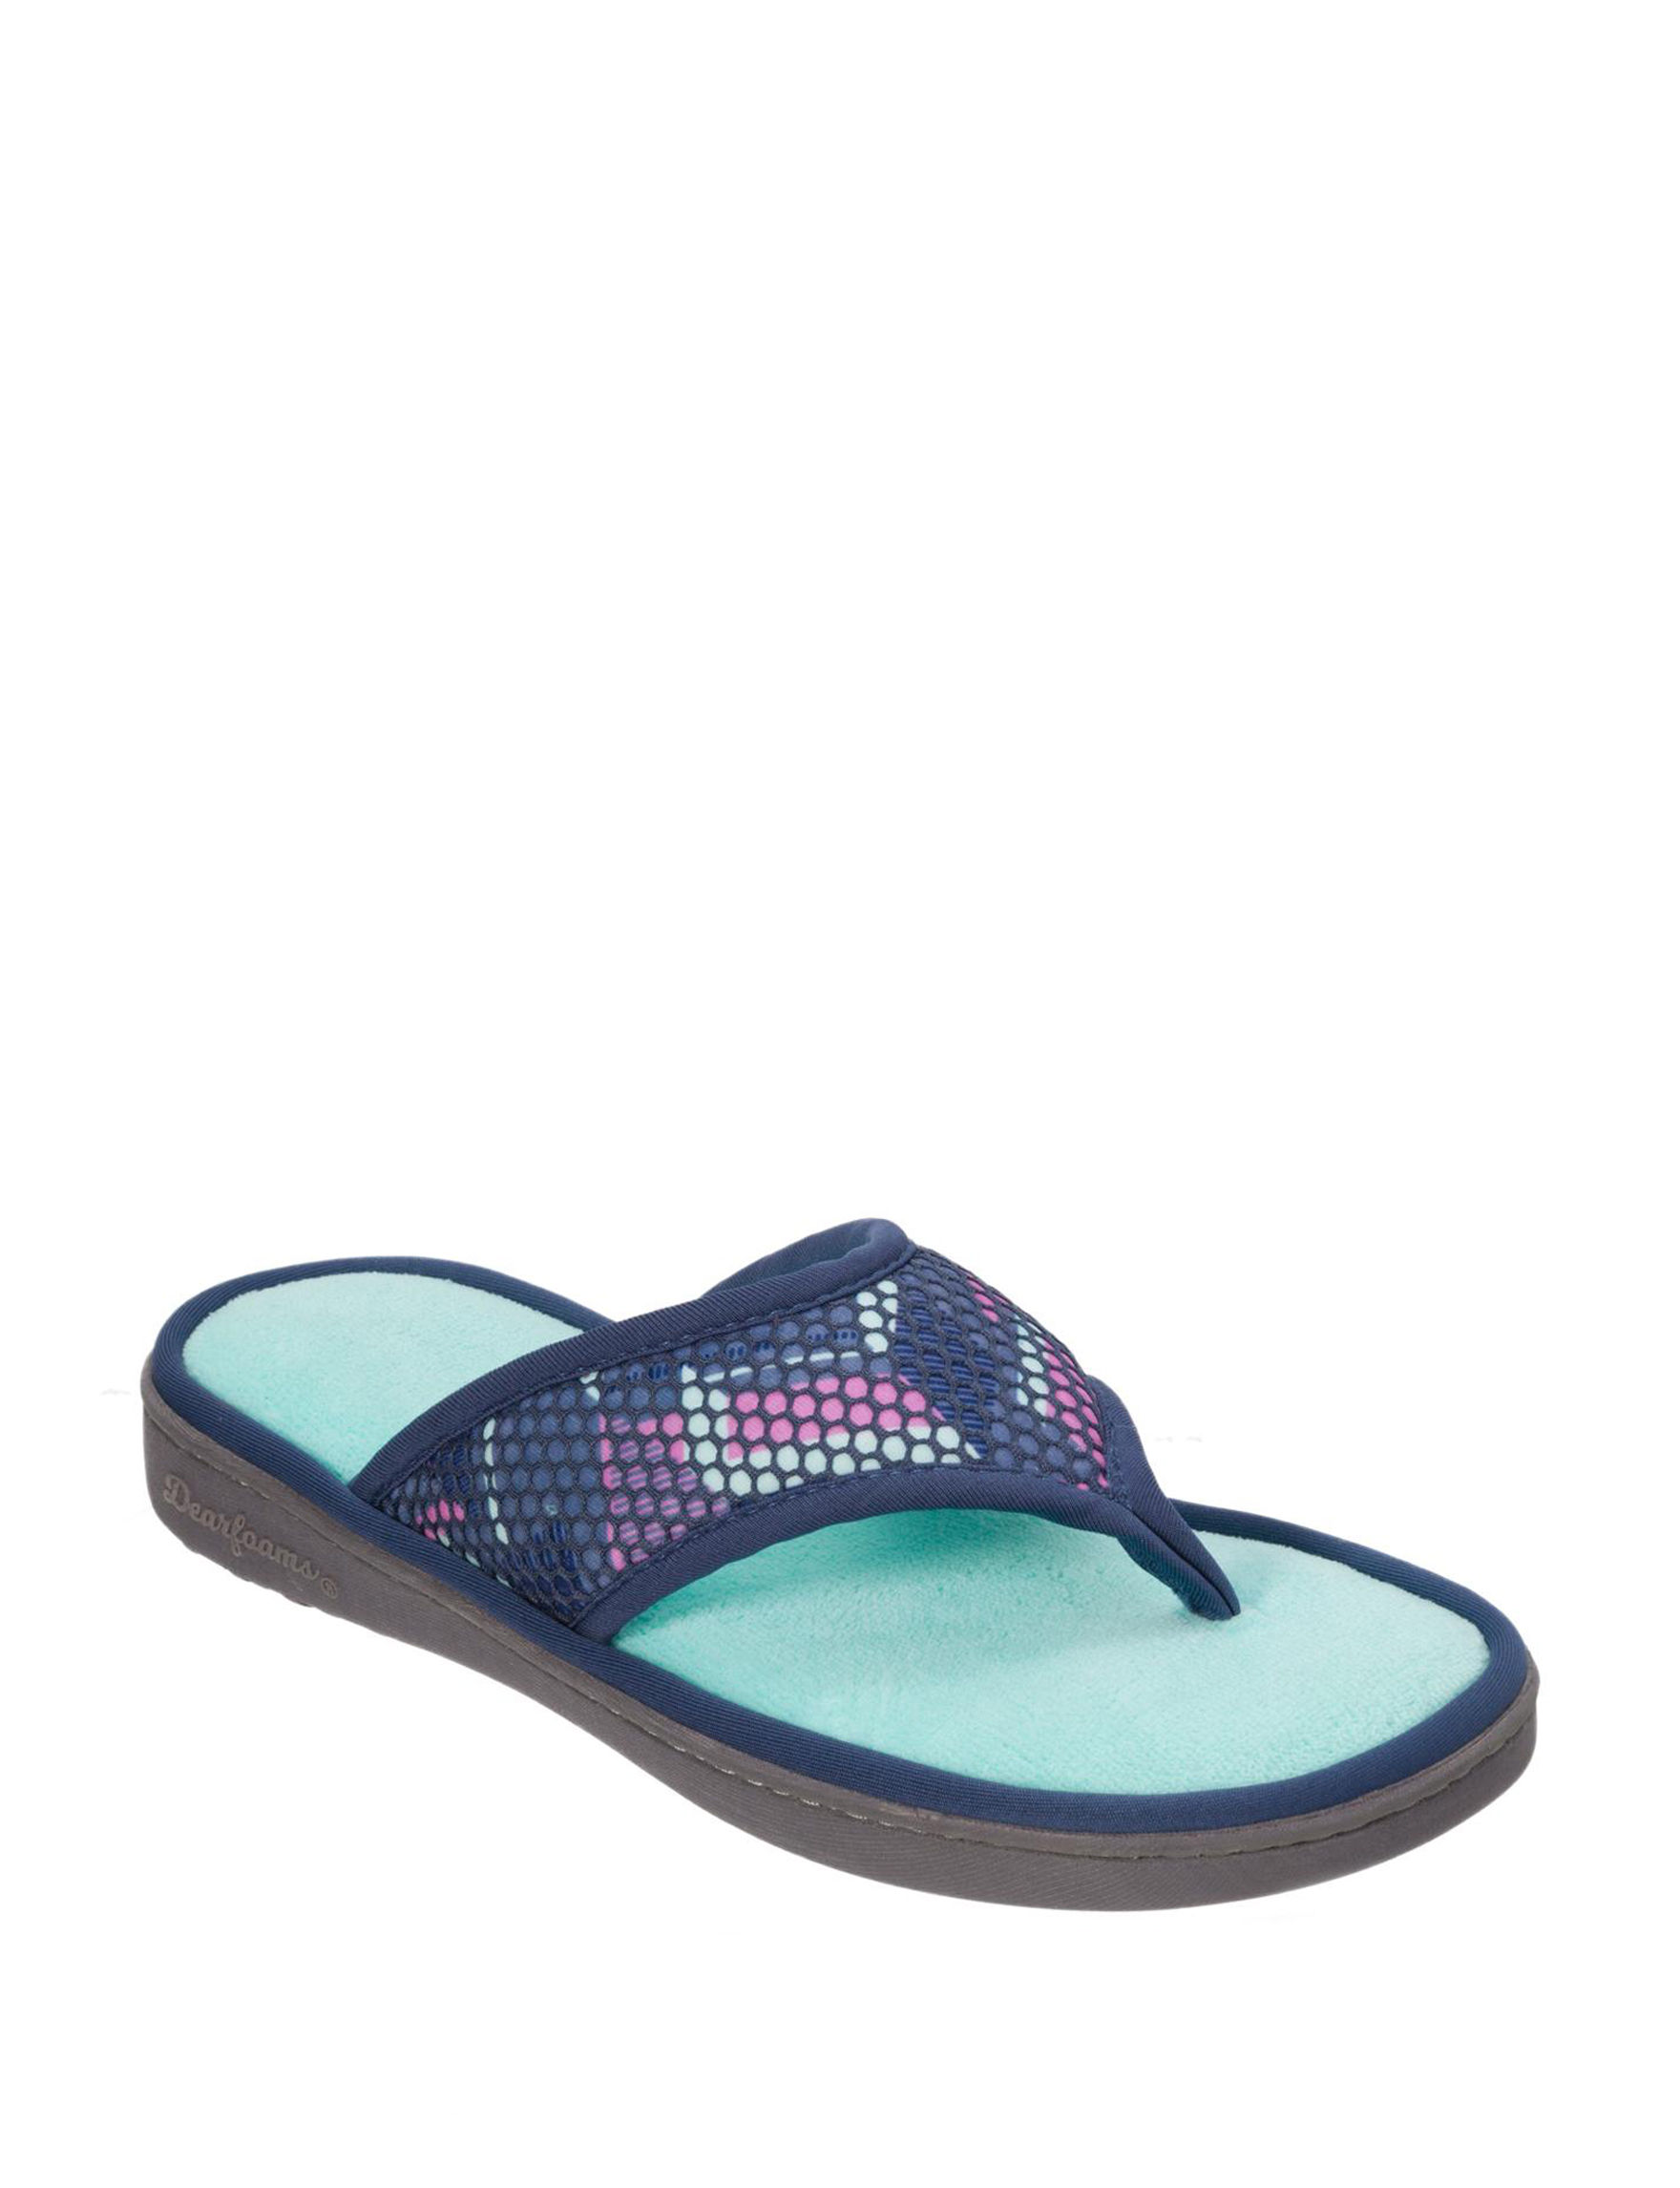 Dearfoams Teal Slipper Sandals